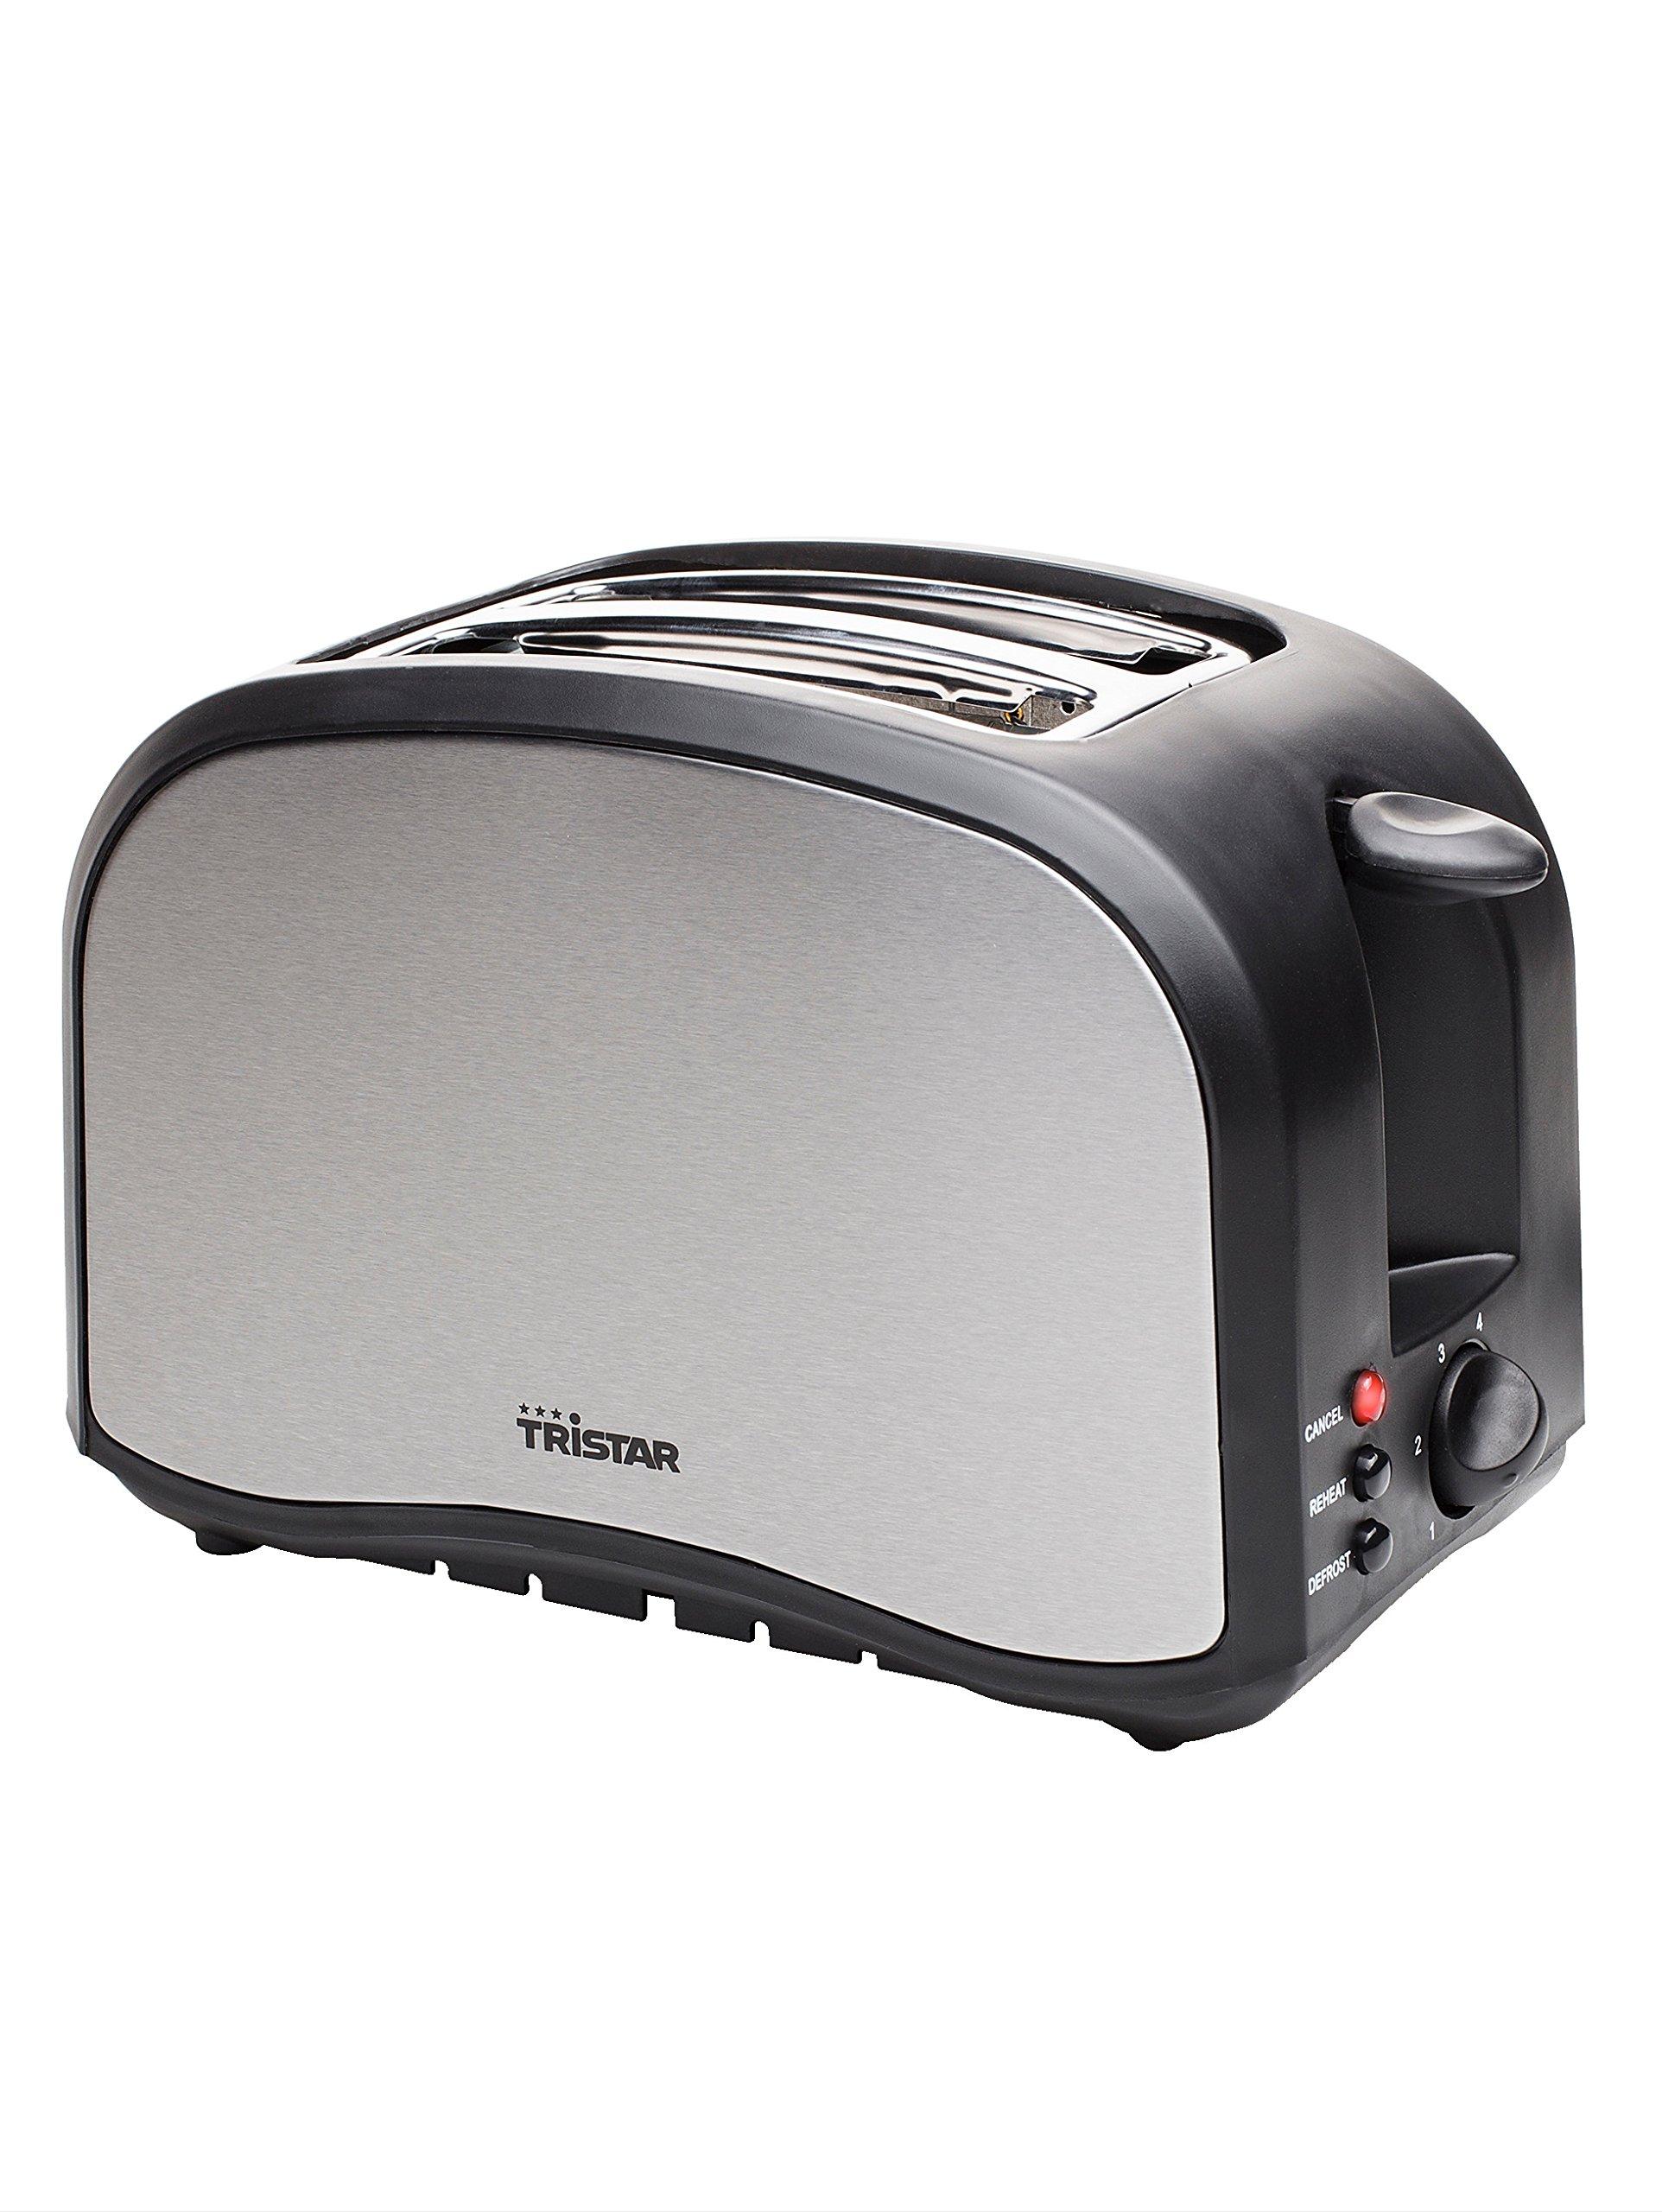 Tristar-Toaster